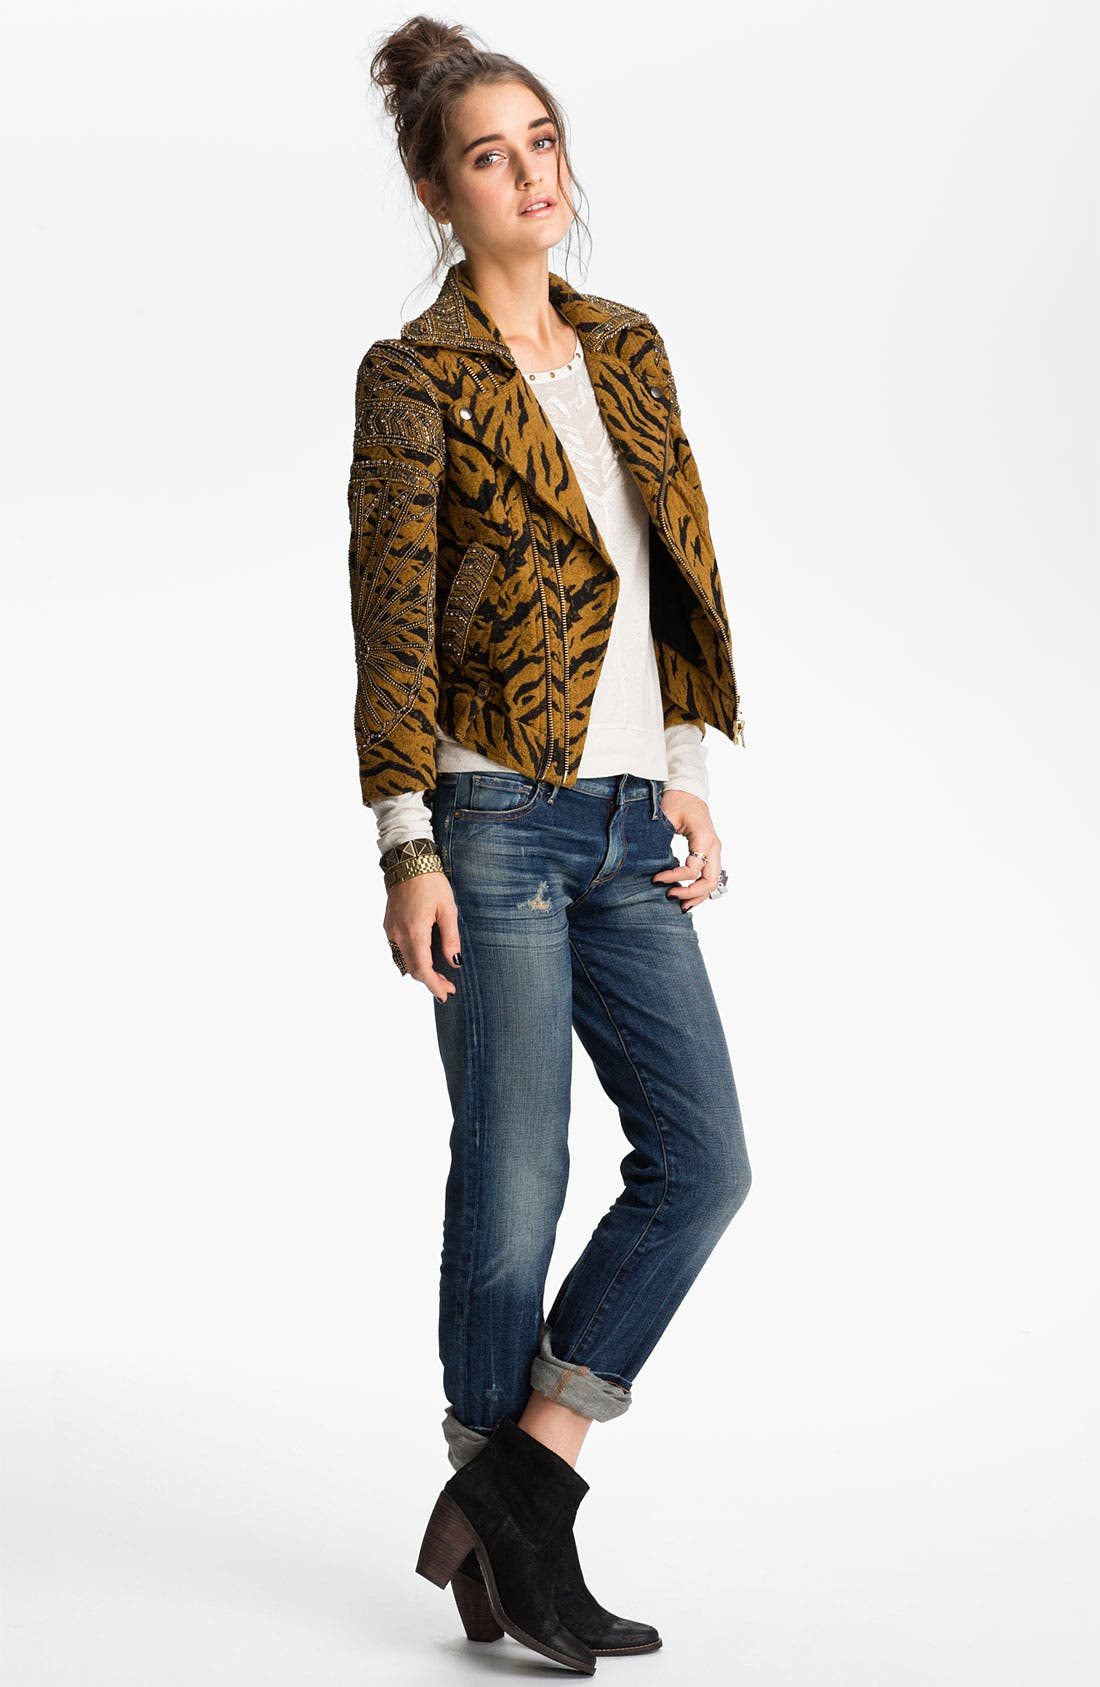 Main Image - Free People Embellished Tiger Jacquard Biker Jacket